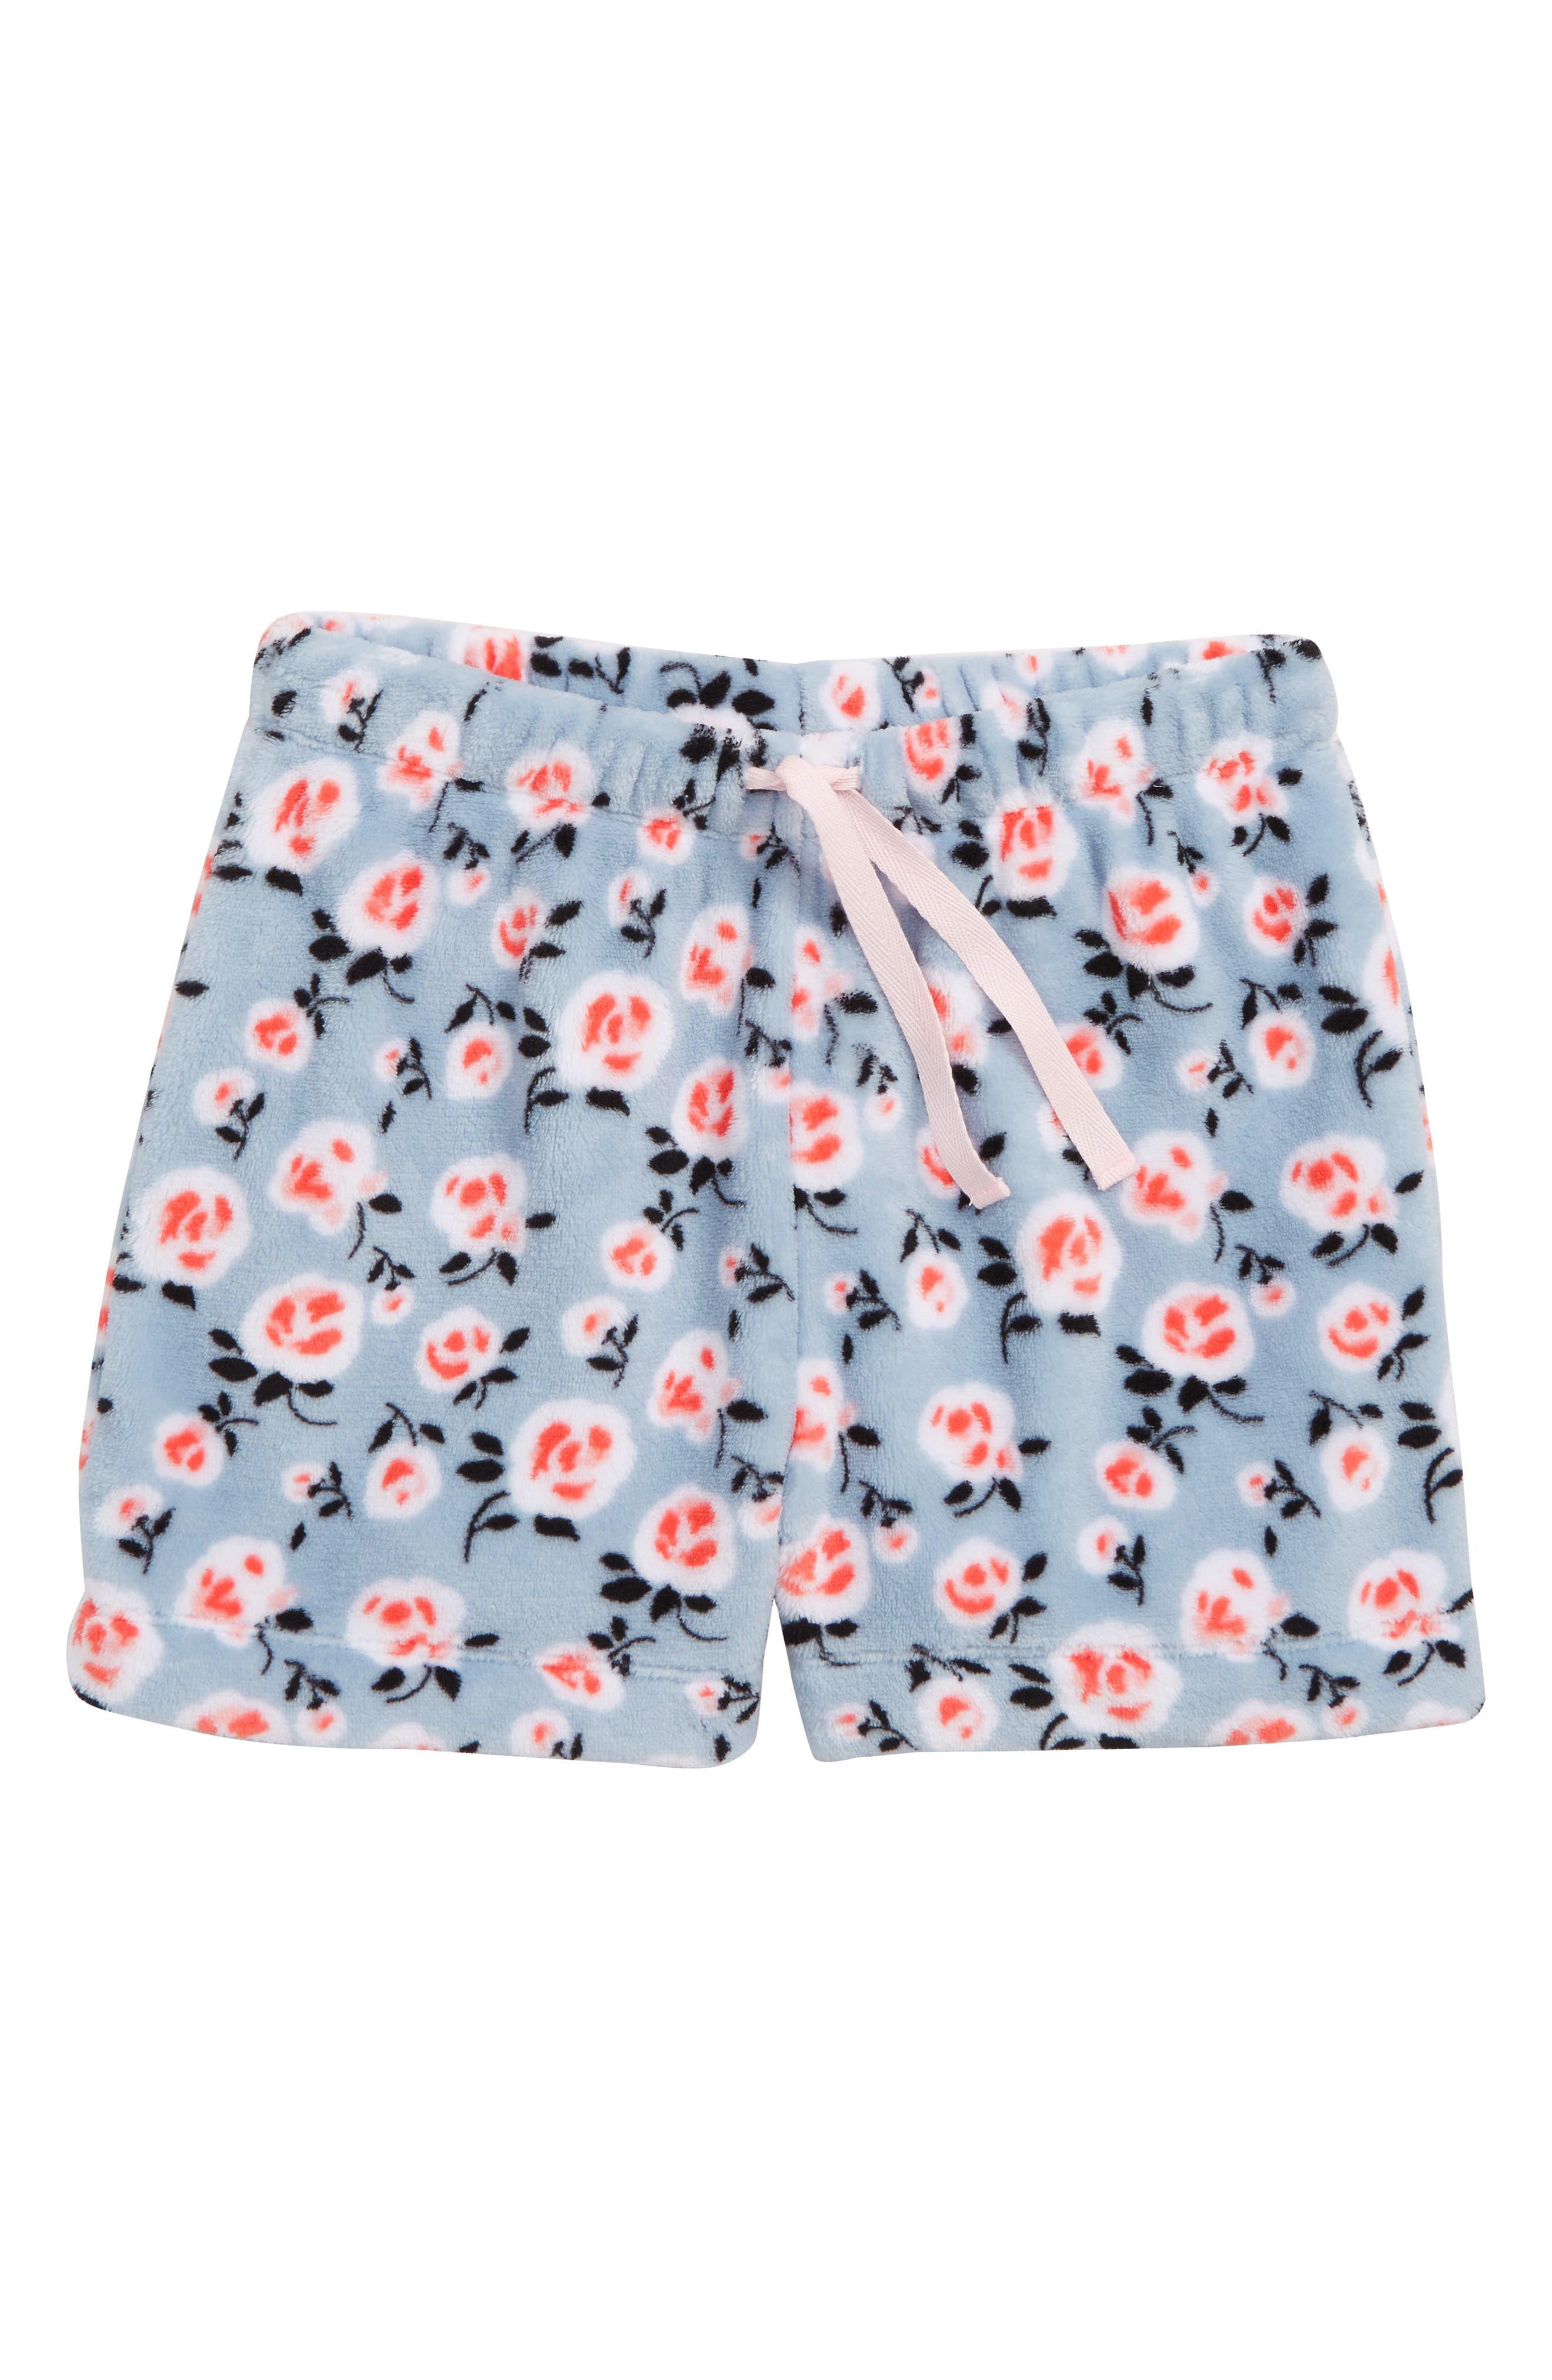 Girls Tucker  Tate Fleece Pajama Pants Size L (1012)  Blue